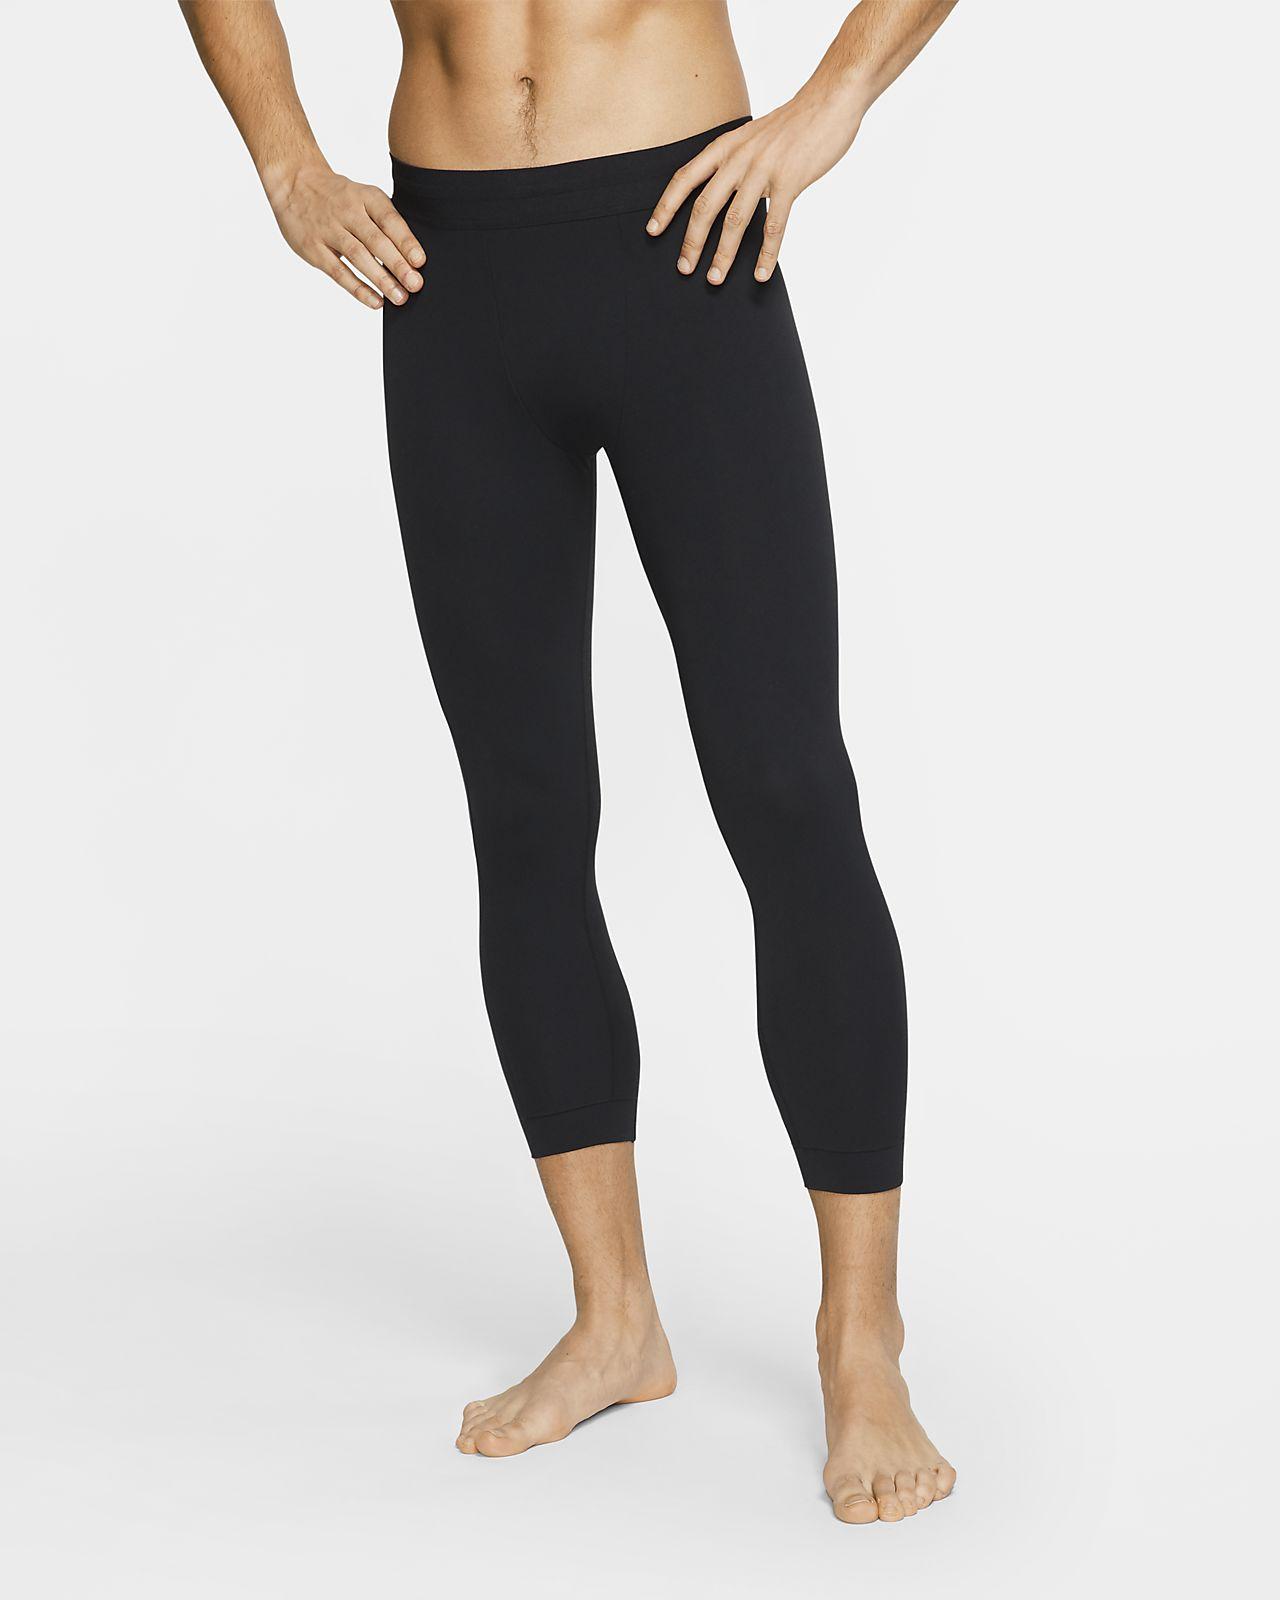 Męskie legginsy Infinalon 3/4 Nike Yoga